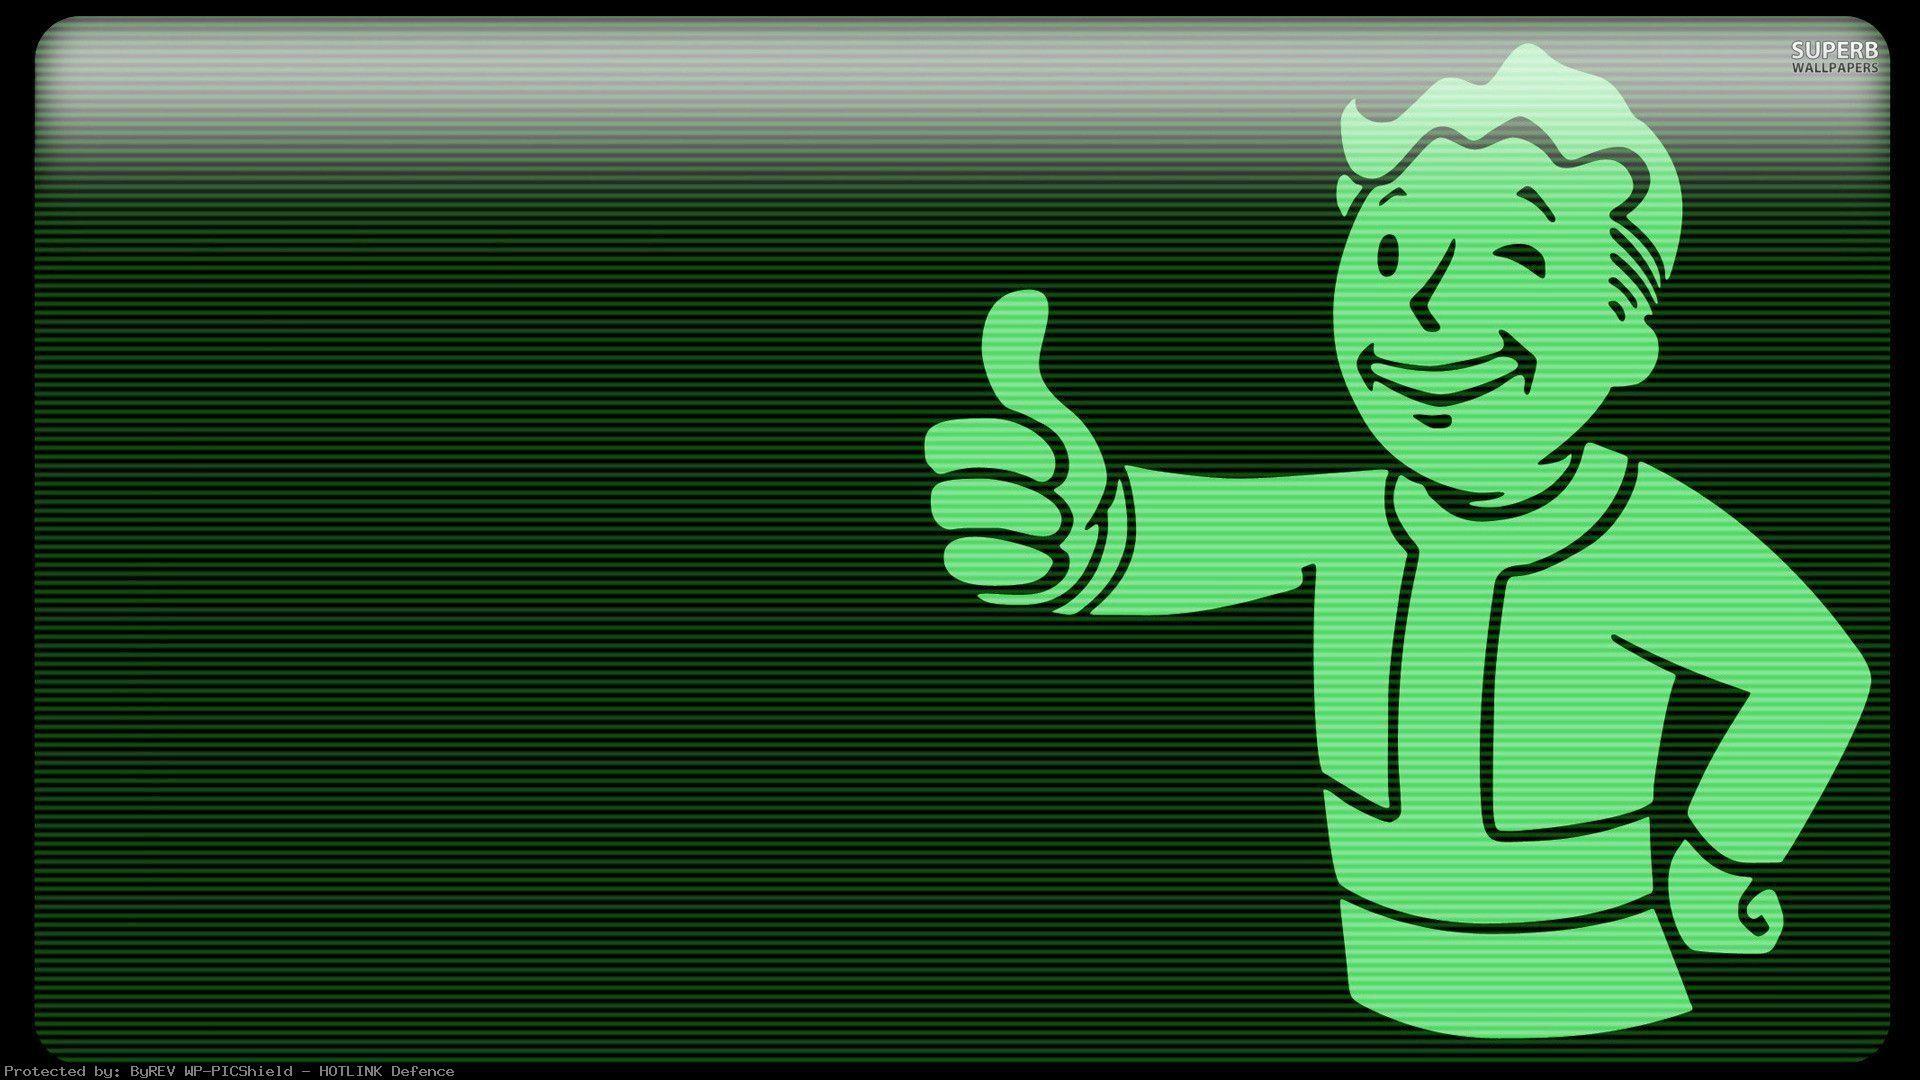 IPhone-Fallout-HD-Desktop-Backgrounds-%C3%97-Fallout